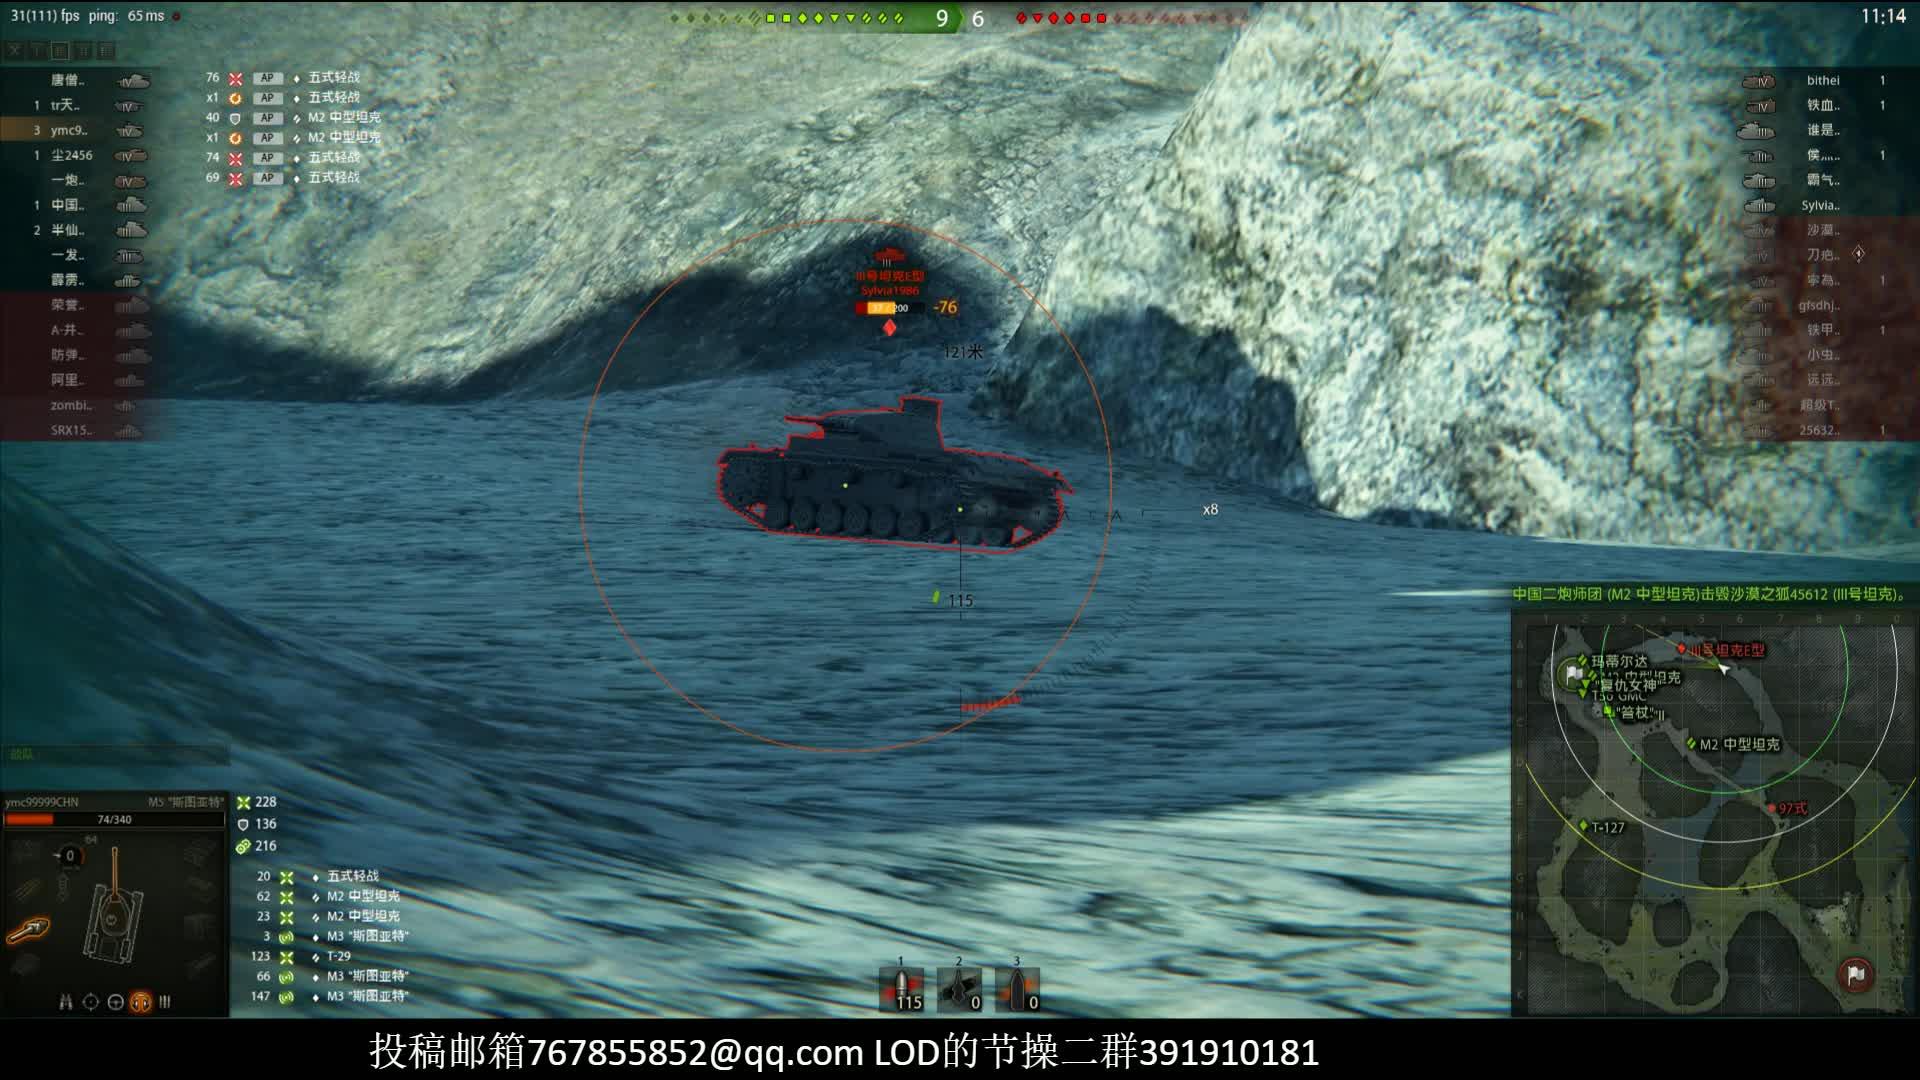 【WO】坦克世界LOD解说 M2小管子戳死你